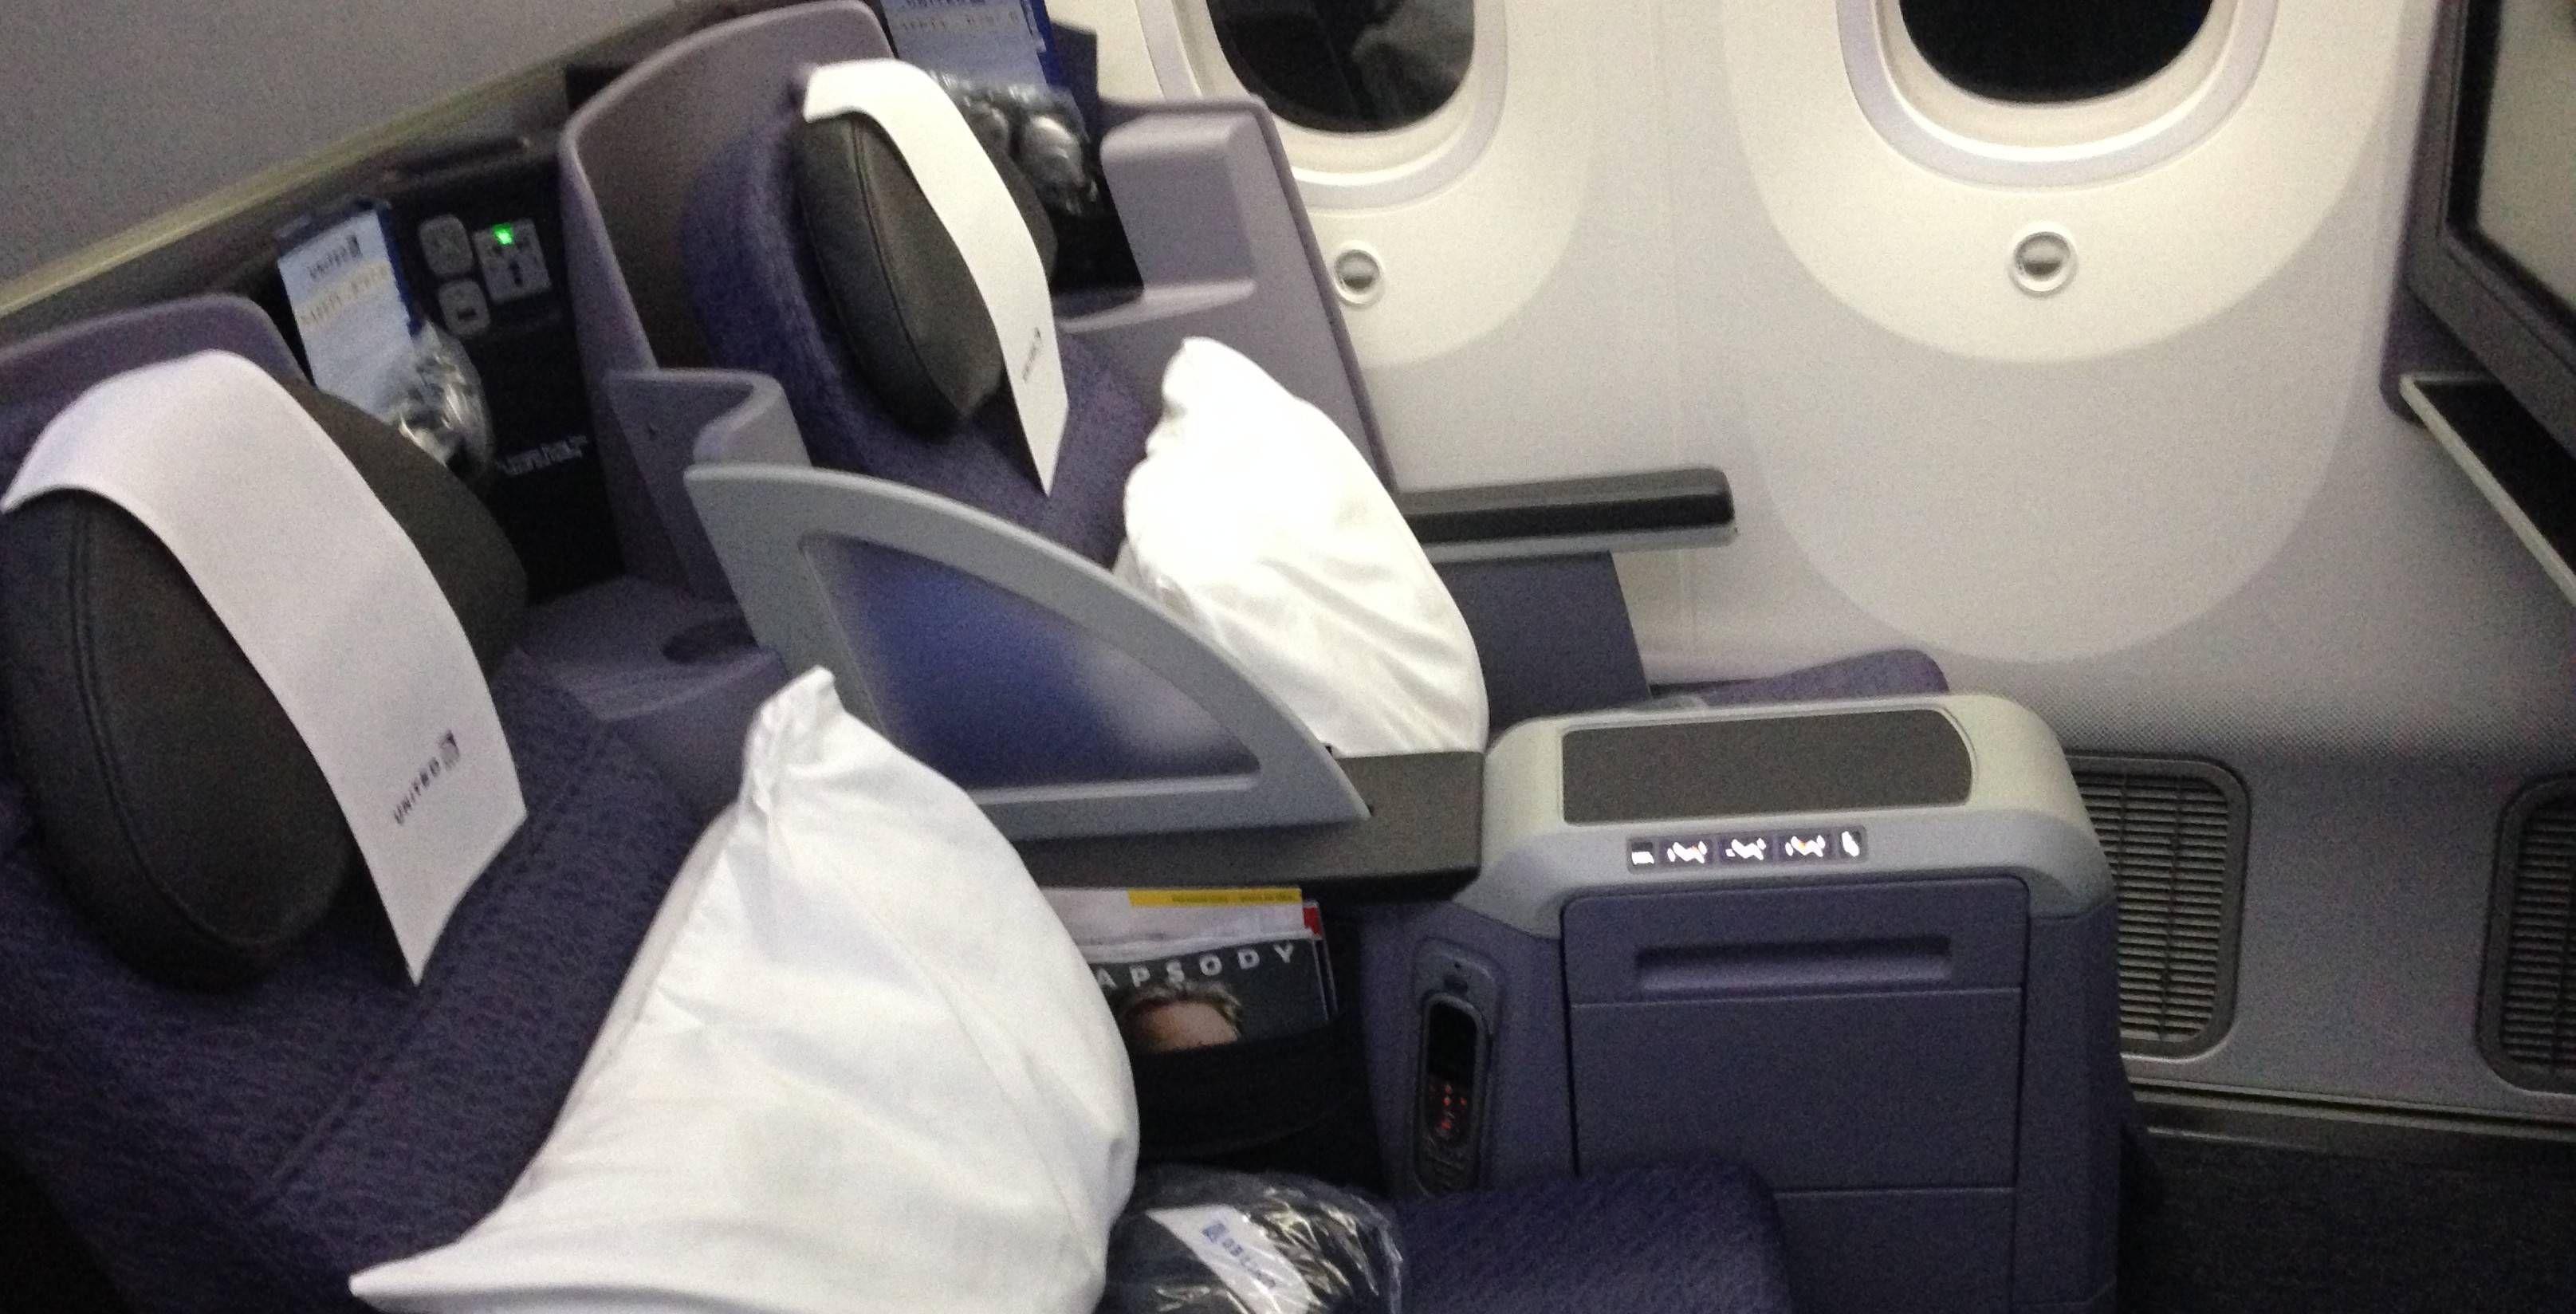 Classe Executiva da United no Boeing 787-800 Dreamliner